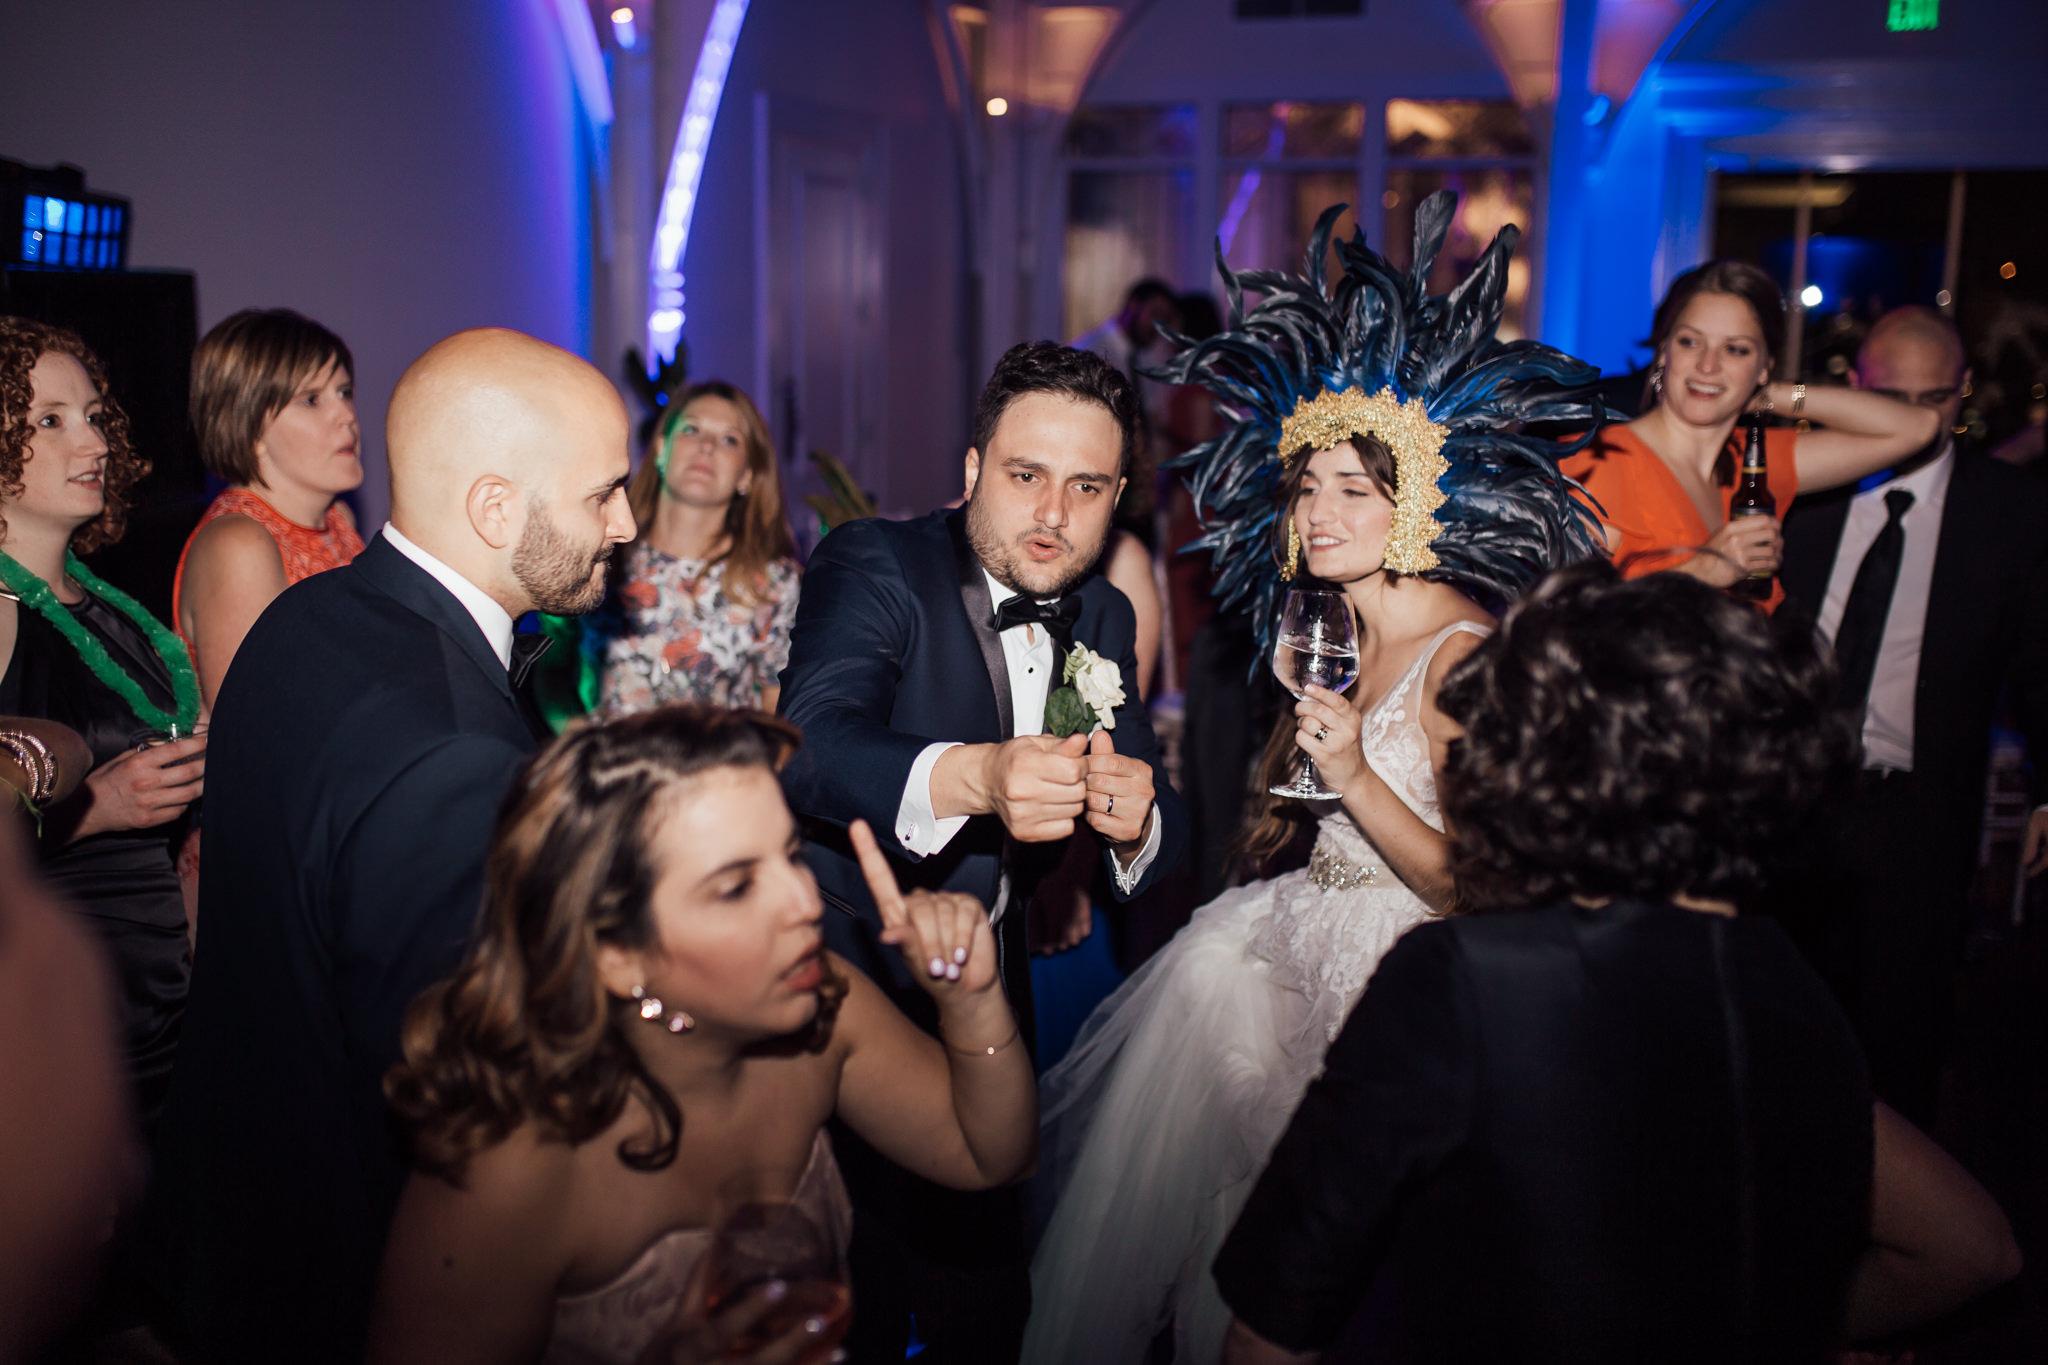 cassie-cook-photography-memphis-wedding-photographer-the-atrium-at-overton-square-55.jpg